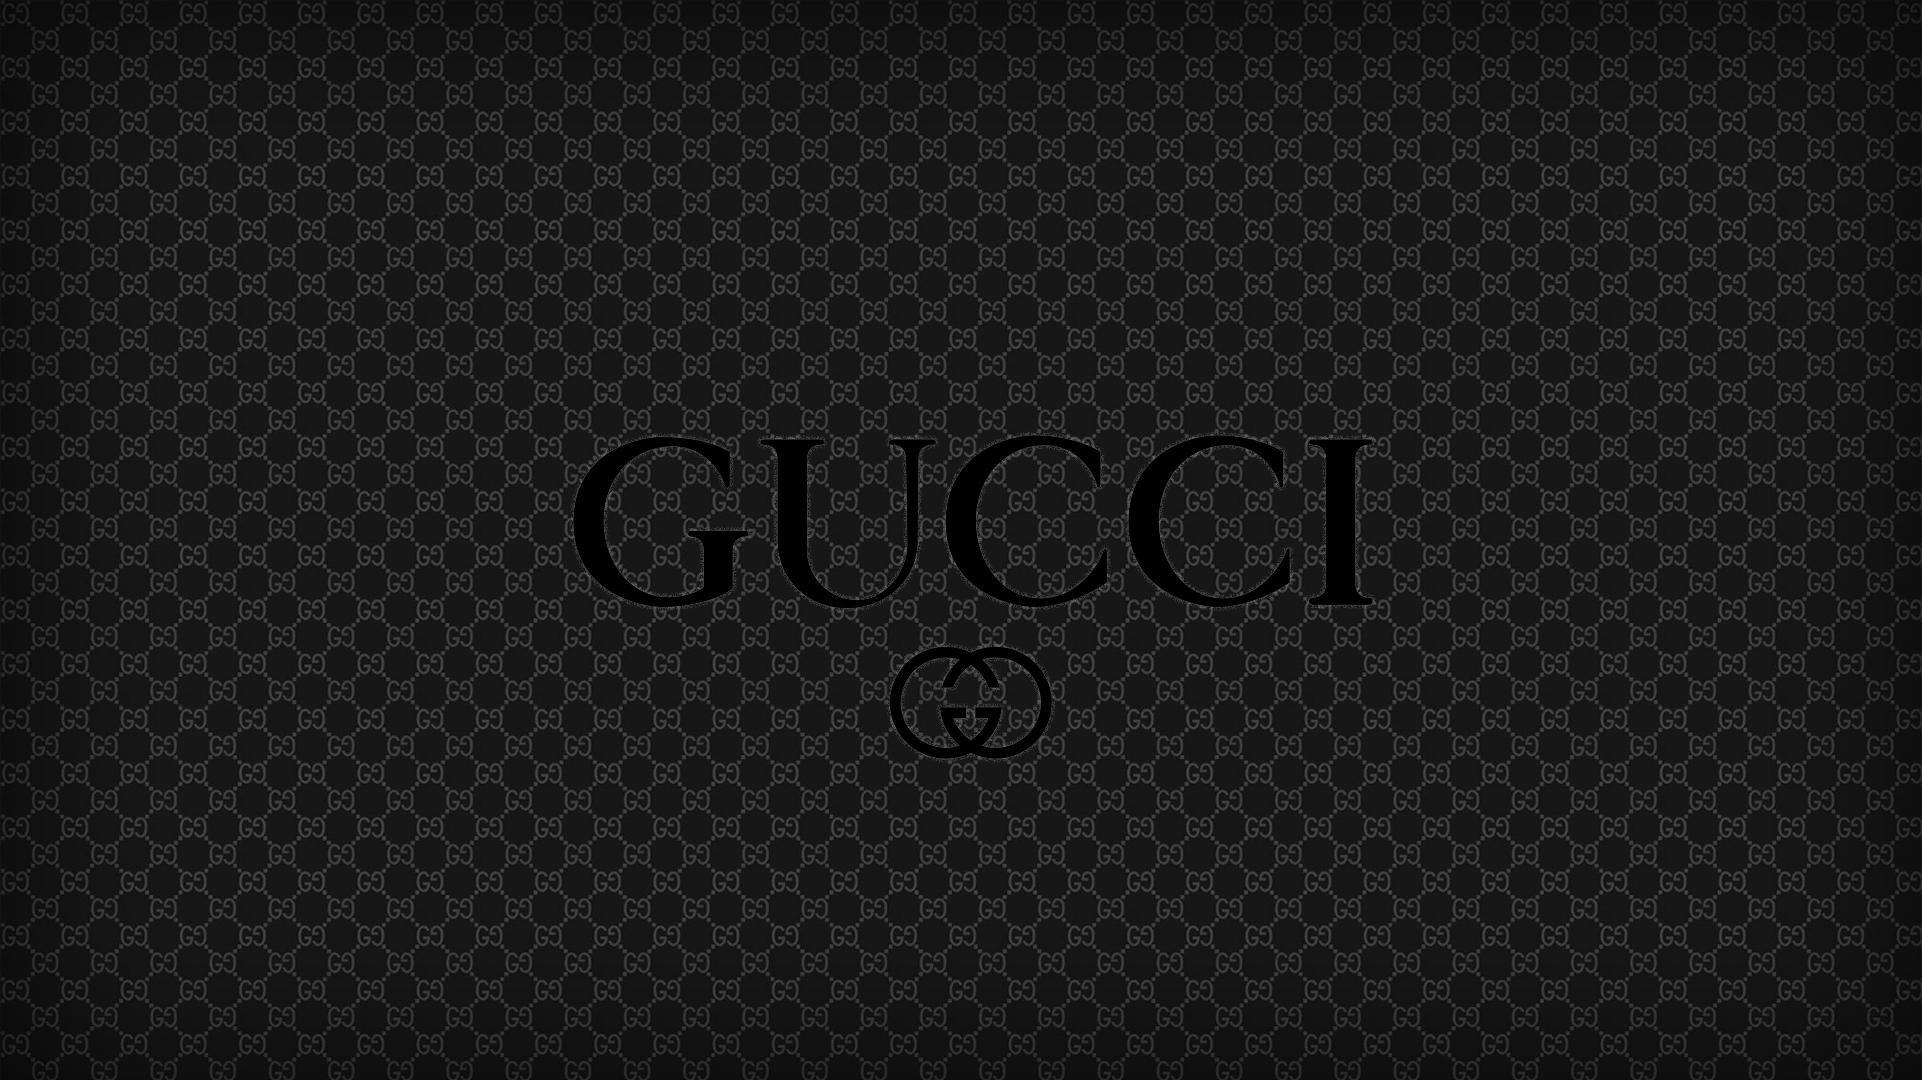 Gucci Mane Wallpaper 73 Images